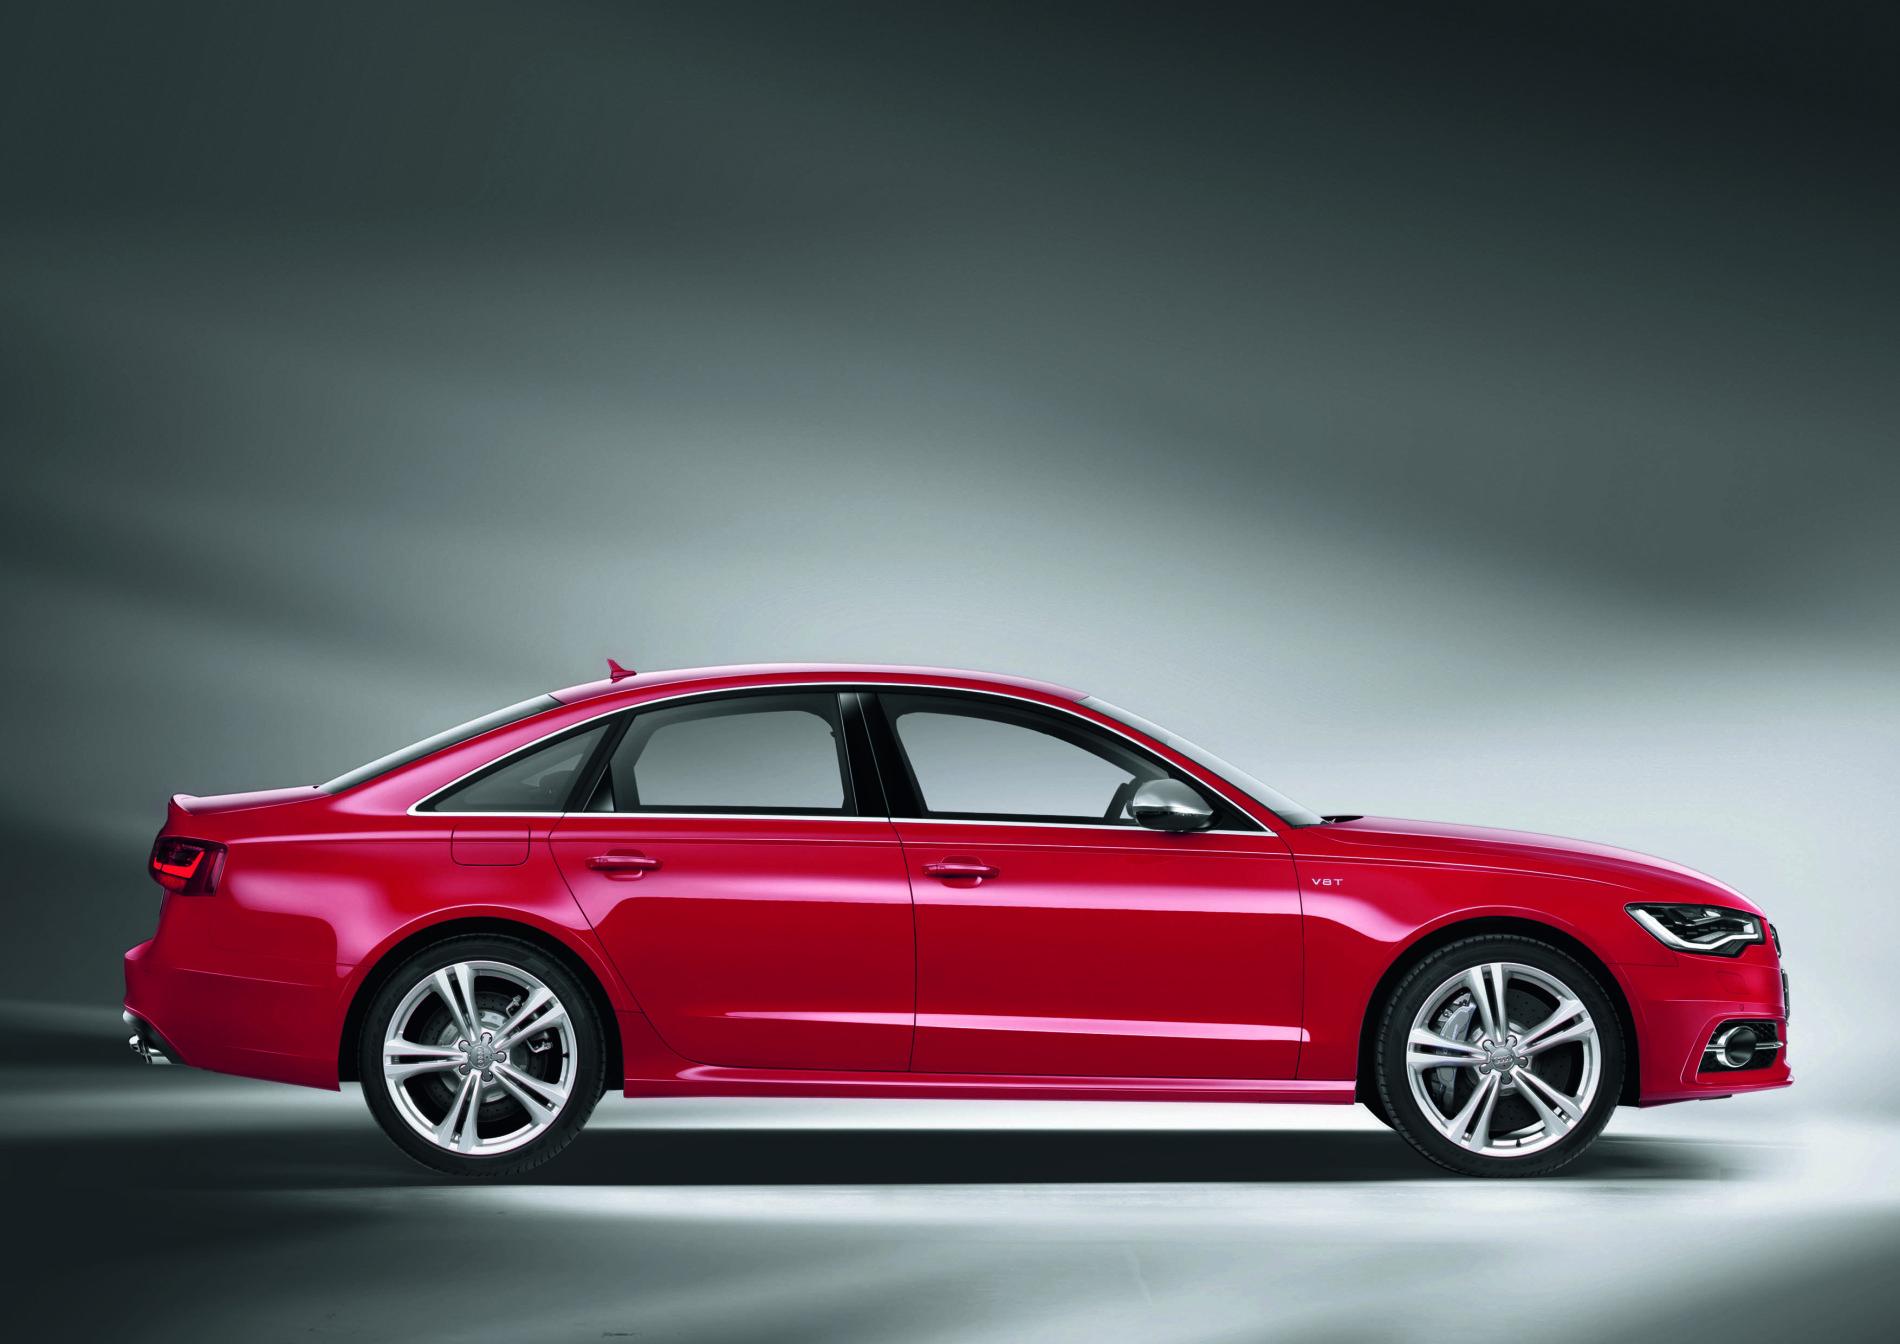 Noul Audi S6 - Noul Audi S6